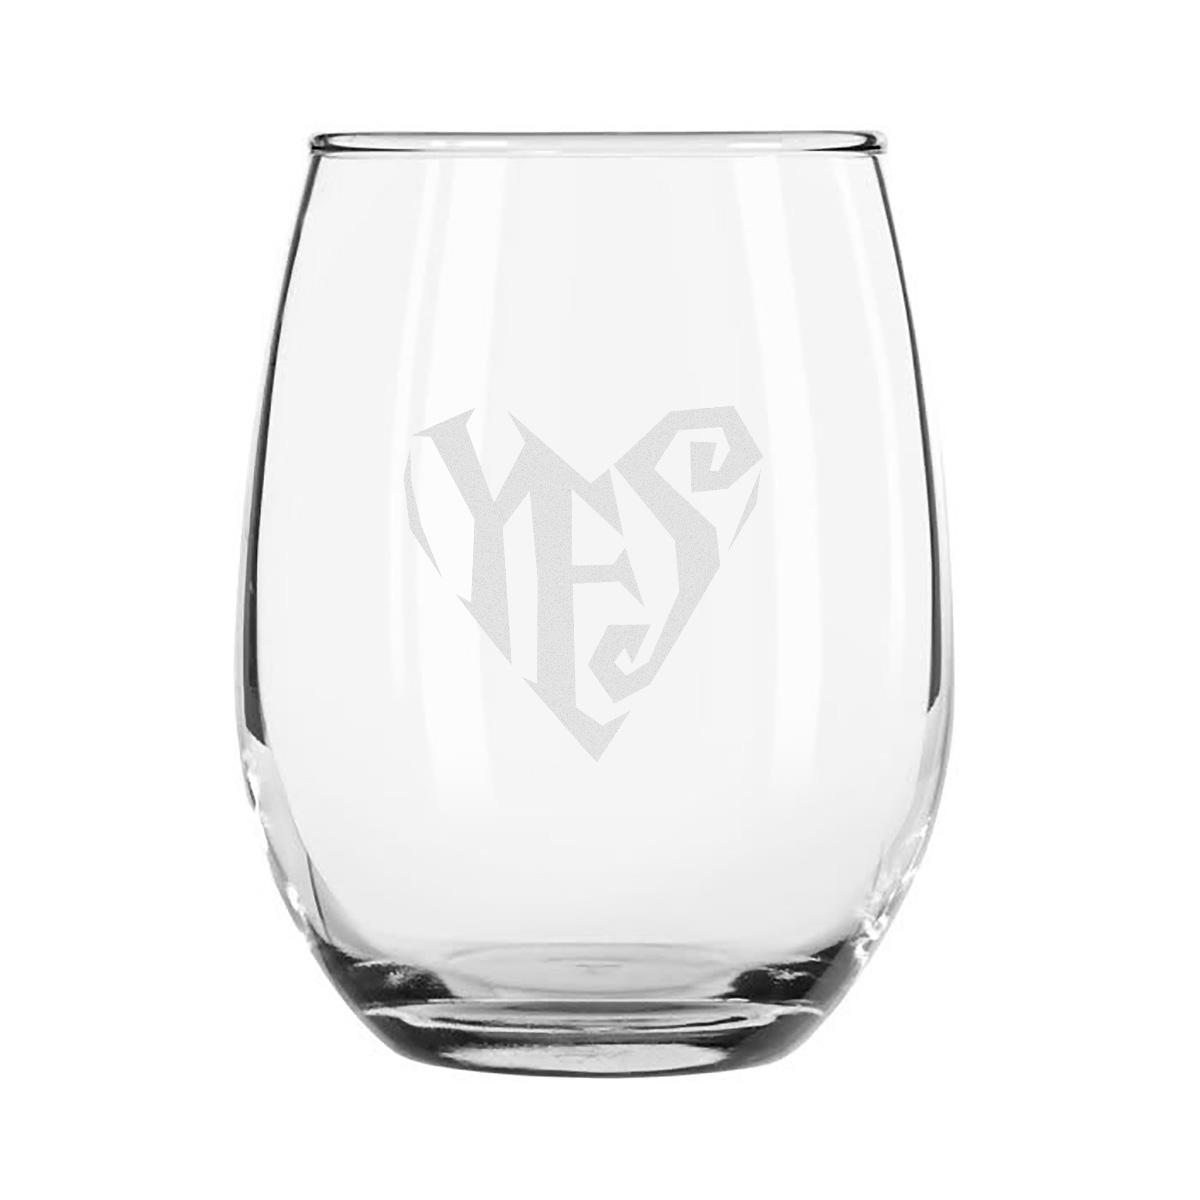 Etched Stemless Wine Glass 4-Piece Set